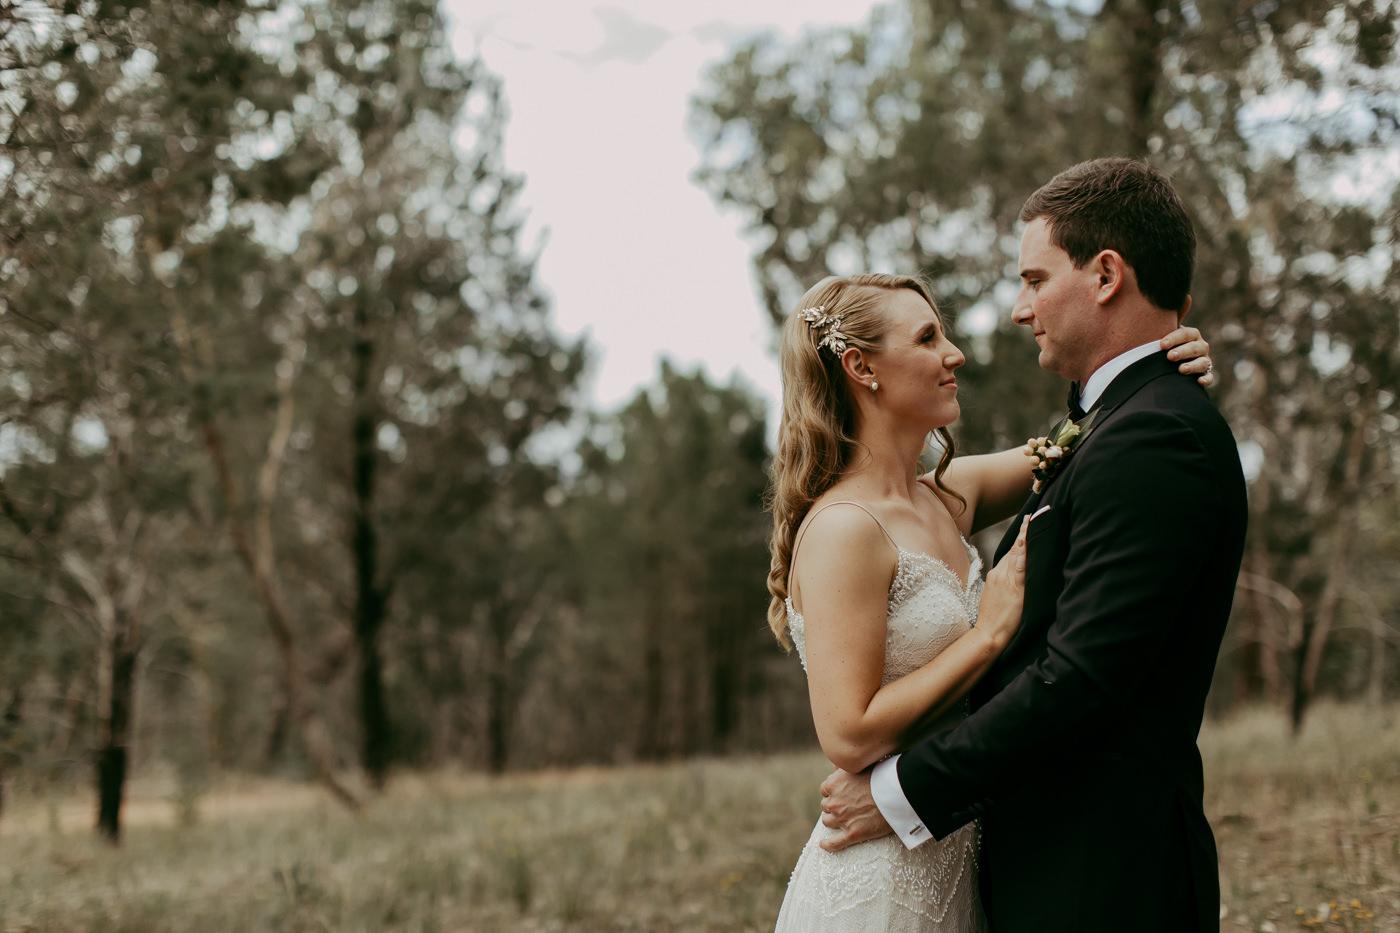 Anthony & Eliet - Wagga Wagga Wedding - Country NSW - Samantha Heather Photography-63.jpg